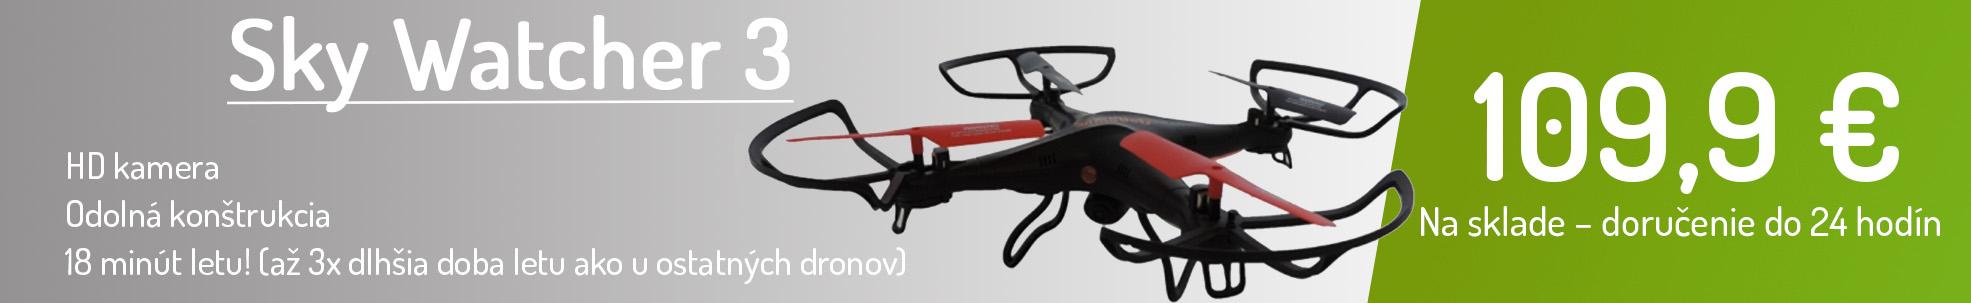 Sky Watcher 3 - RC dron, HD kamera, na sklade